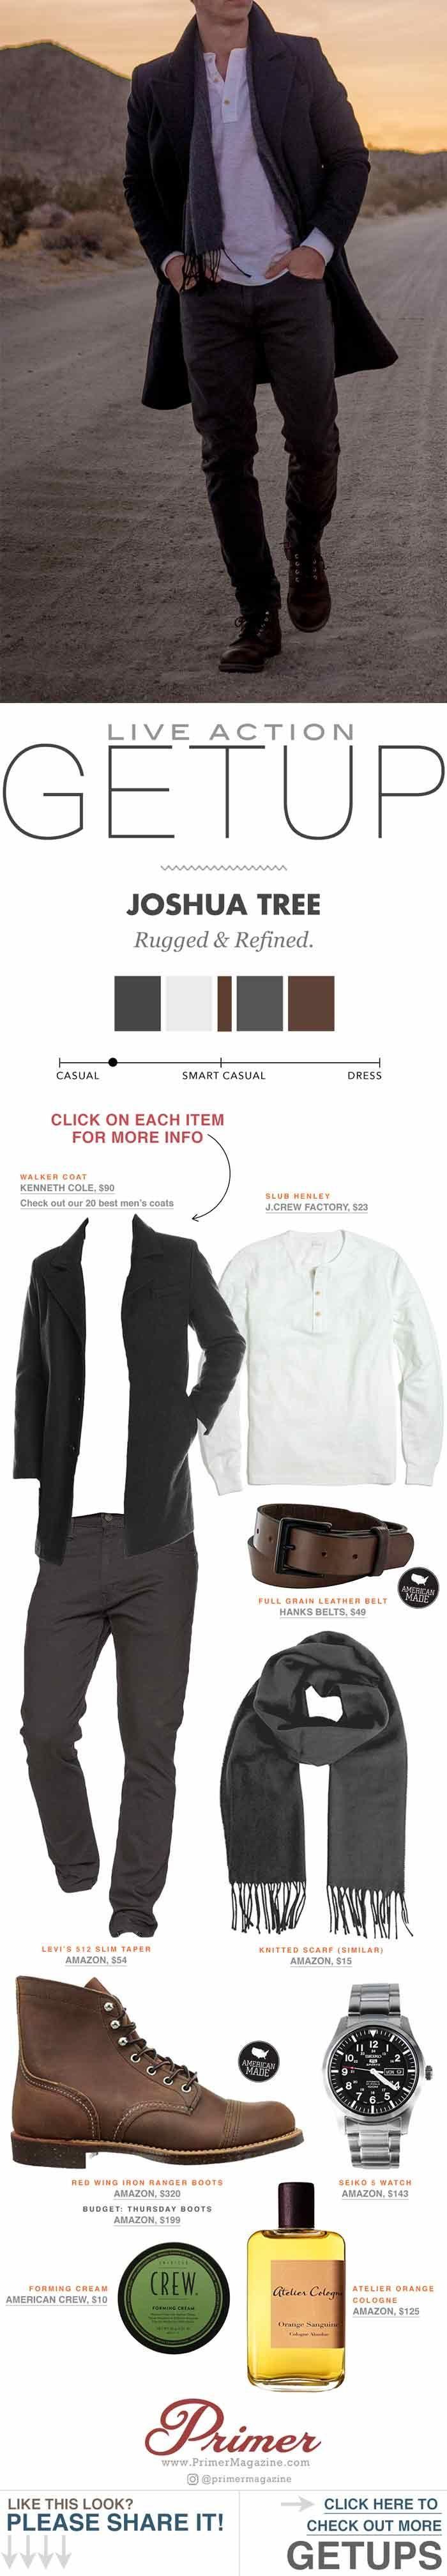 men's fashion inspiration outfit ideas live action getup primer magazine rugged fall winter #MensFashionRugged